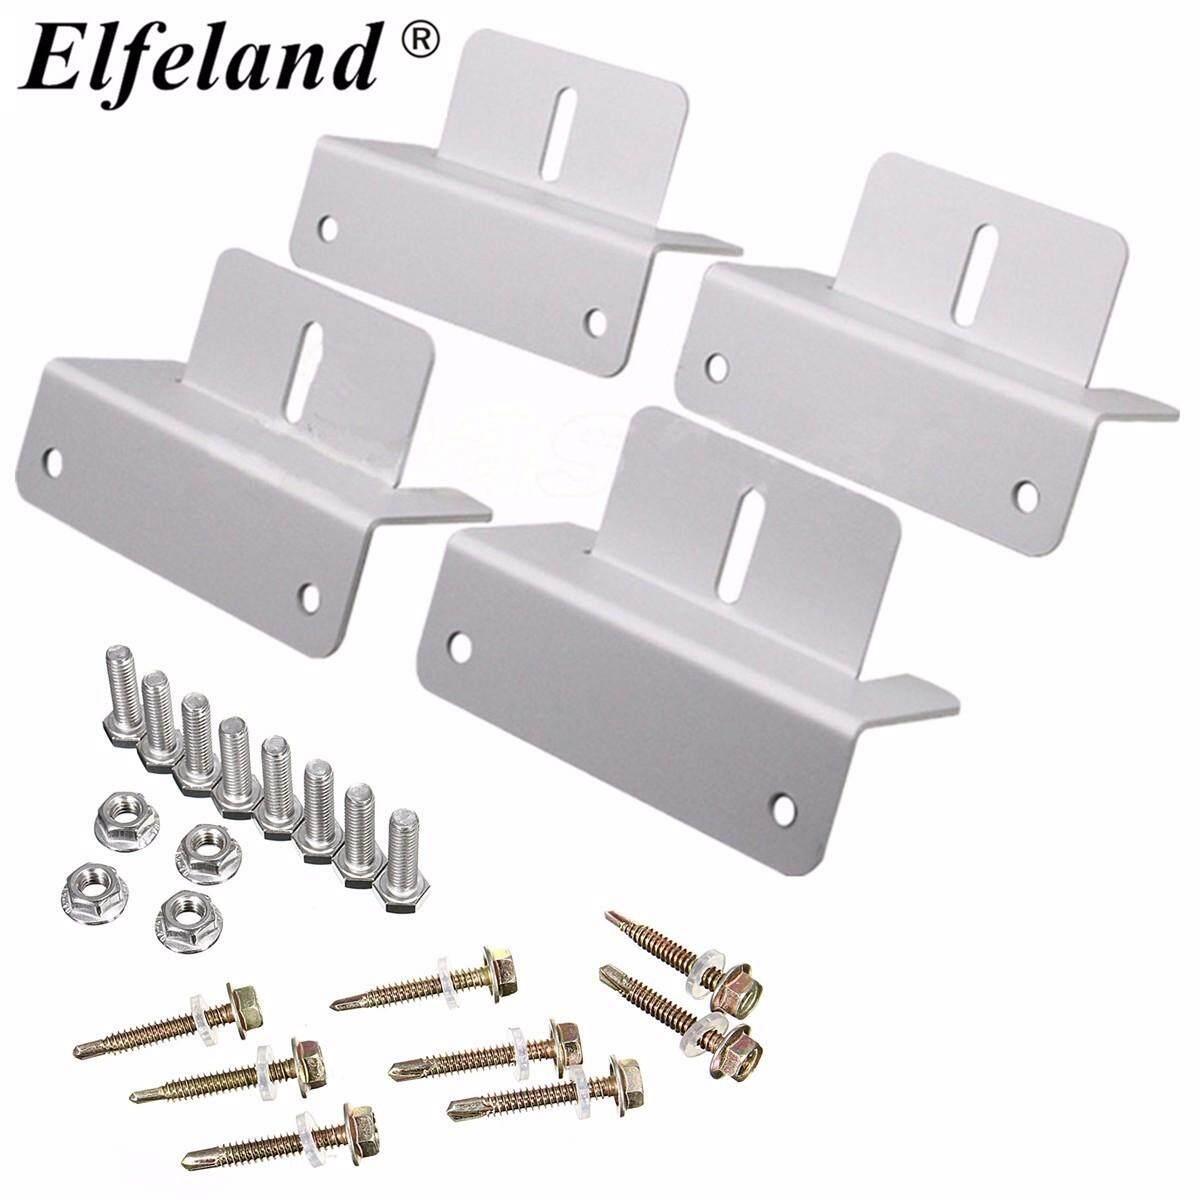 【Free Shipping + Flash Deal】Elfeland Solar Panel Mounting Bracket 4pcs Sets  Kit For Flat Roof Wall Aluminum